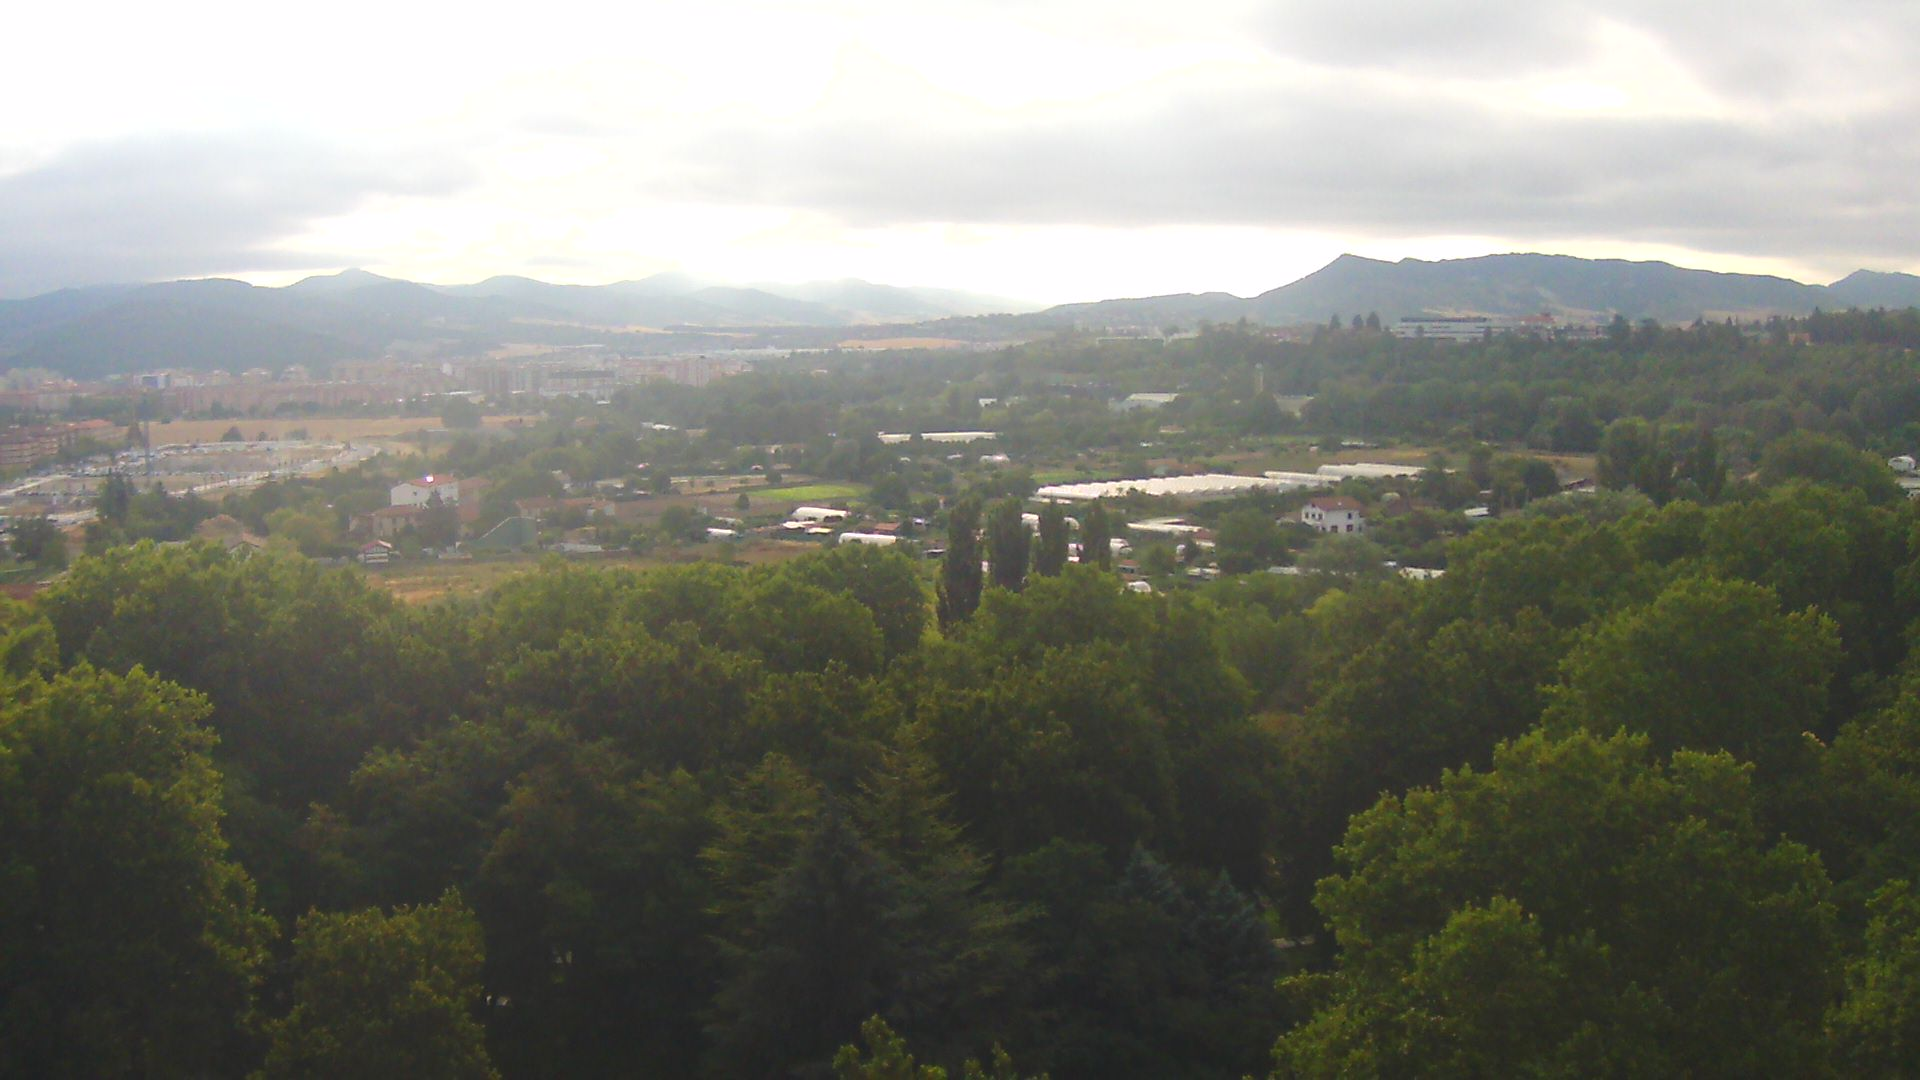 Pamplona So. 08:46